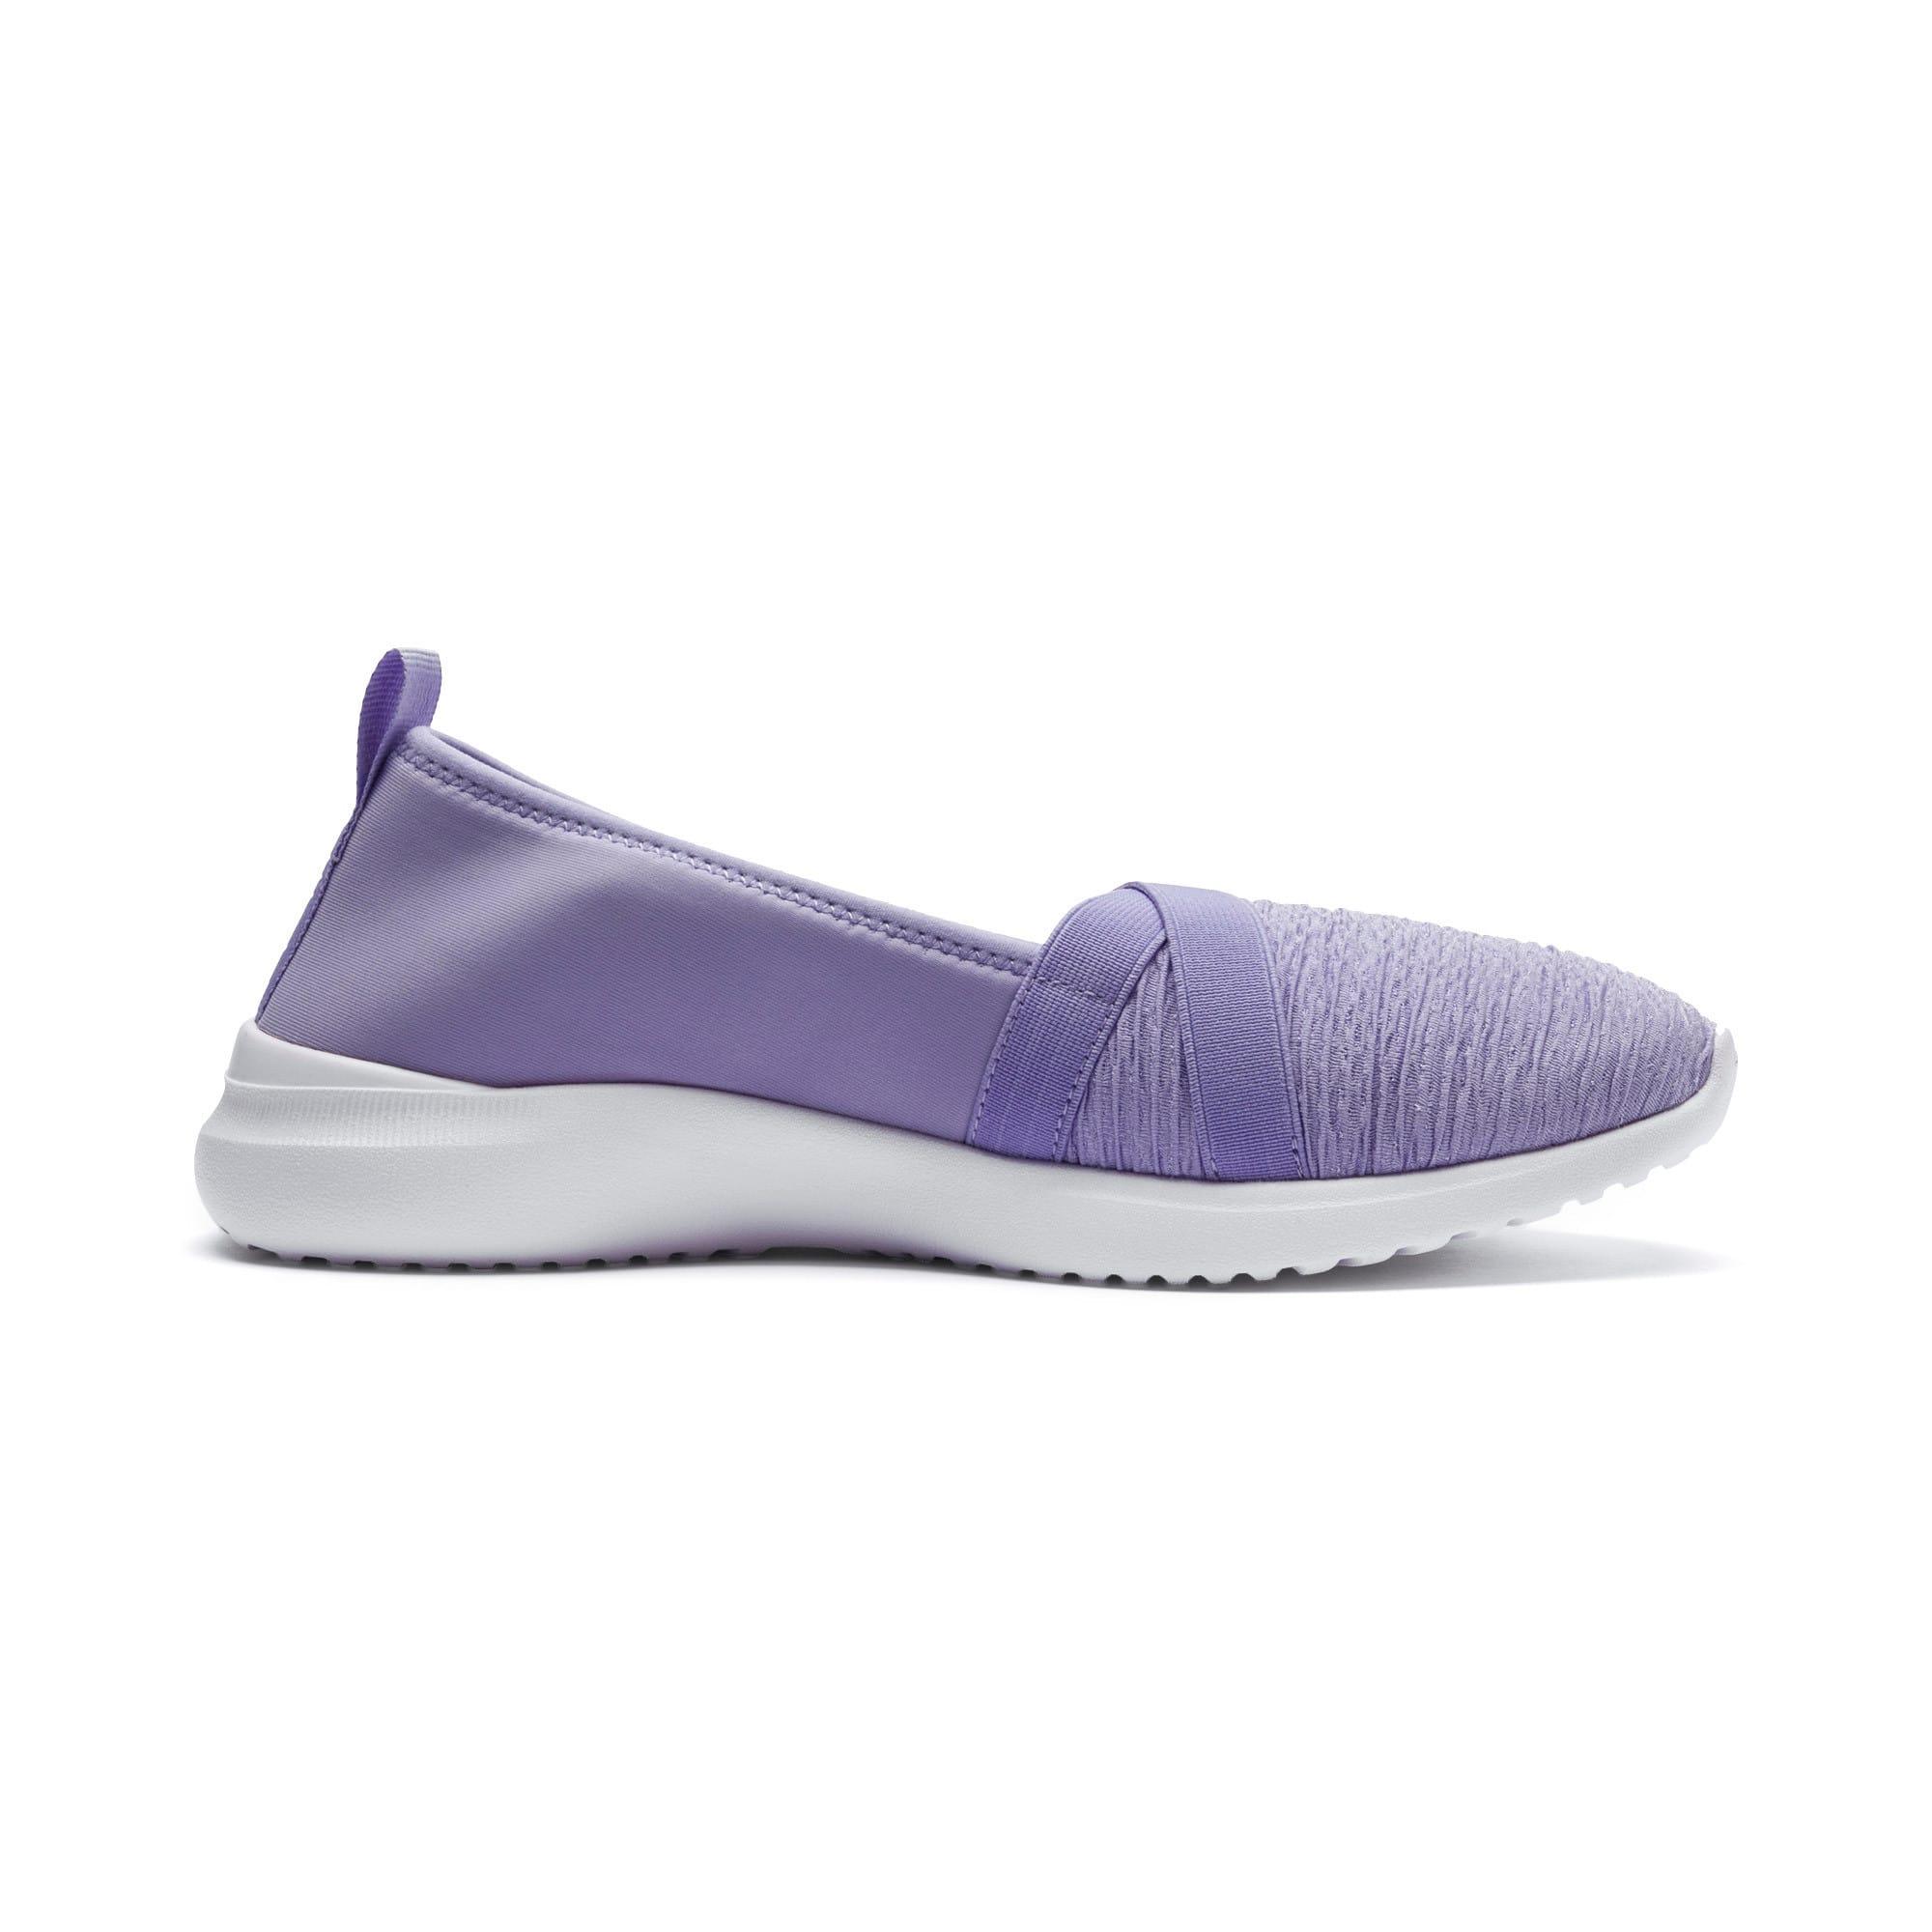 Thumbnail 5 of Adelina Women's Ballet Shoes, Sweet Lavender-Team Gold, medium